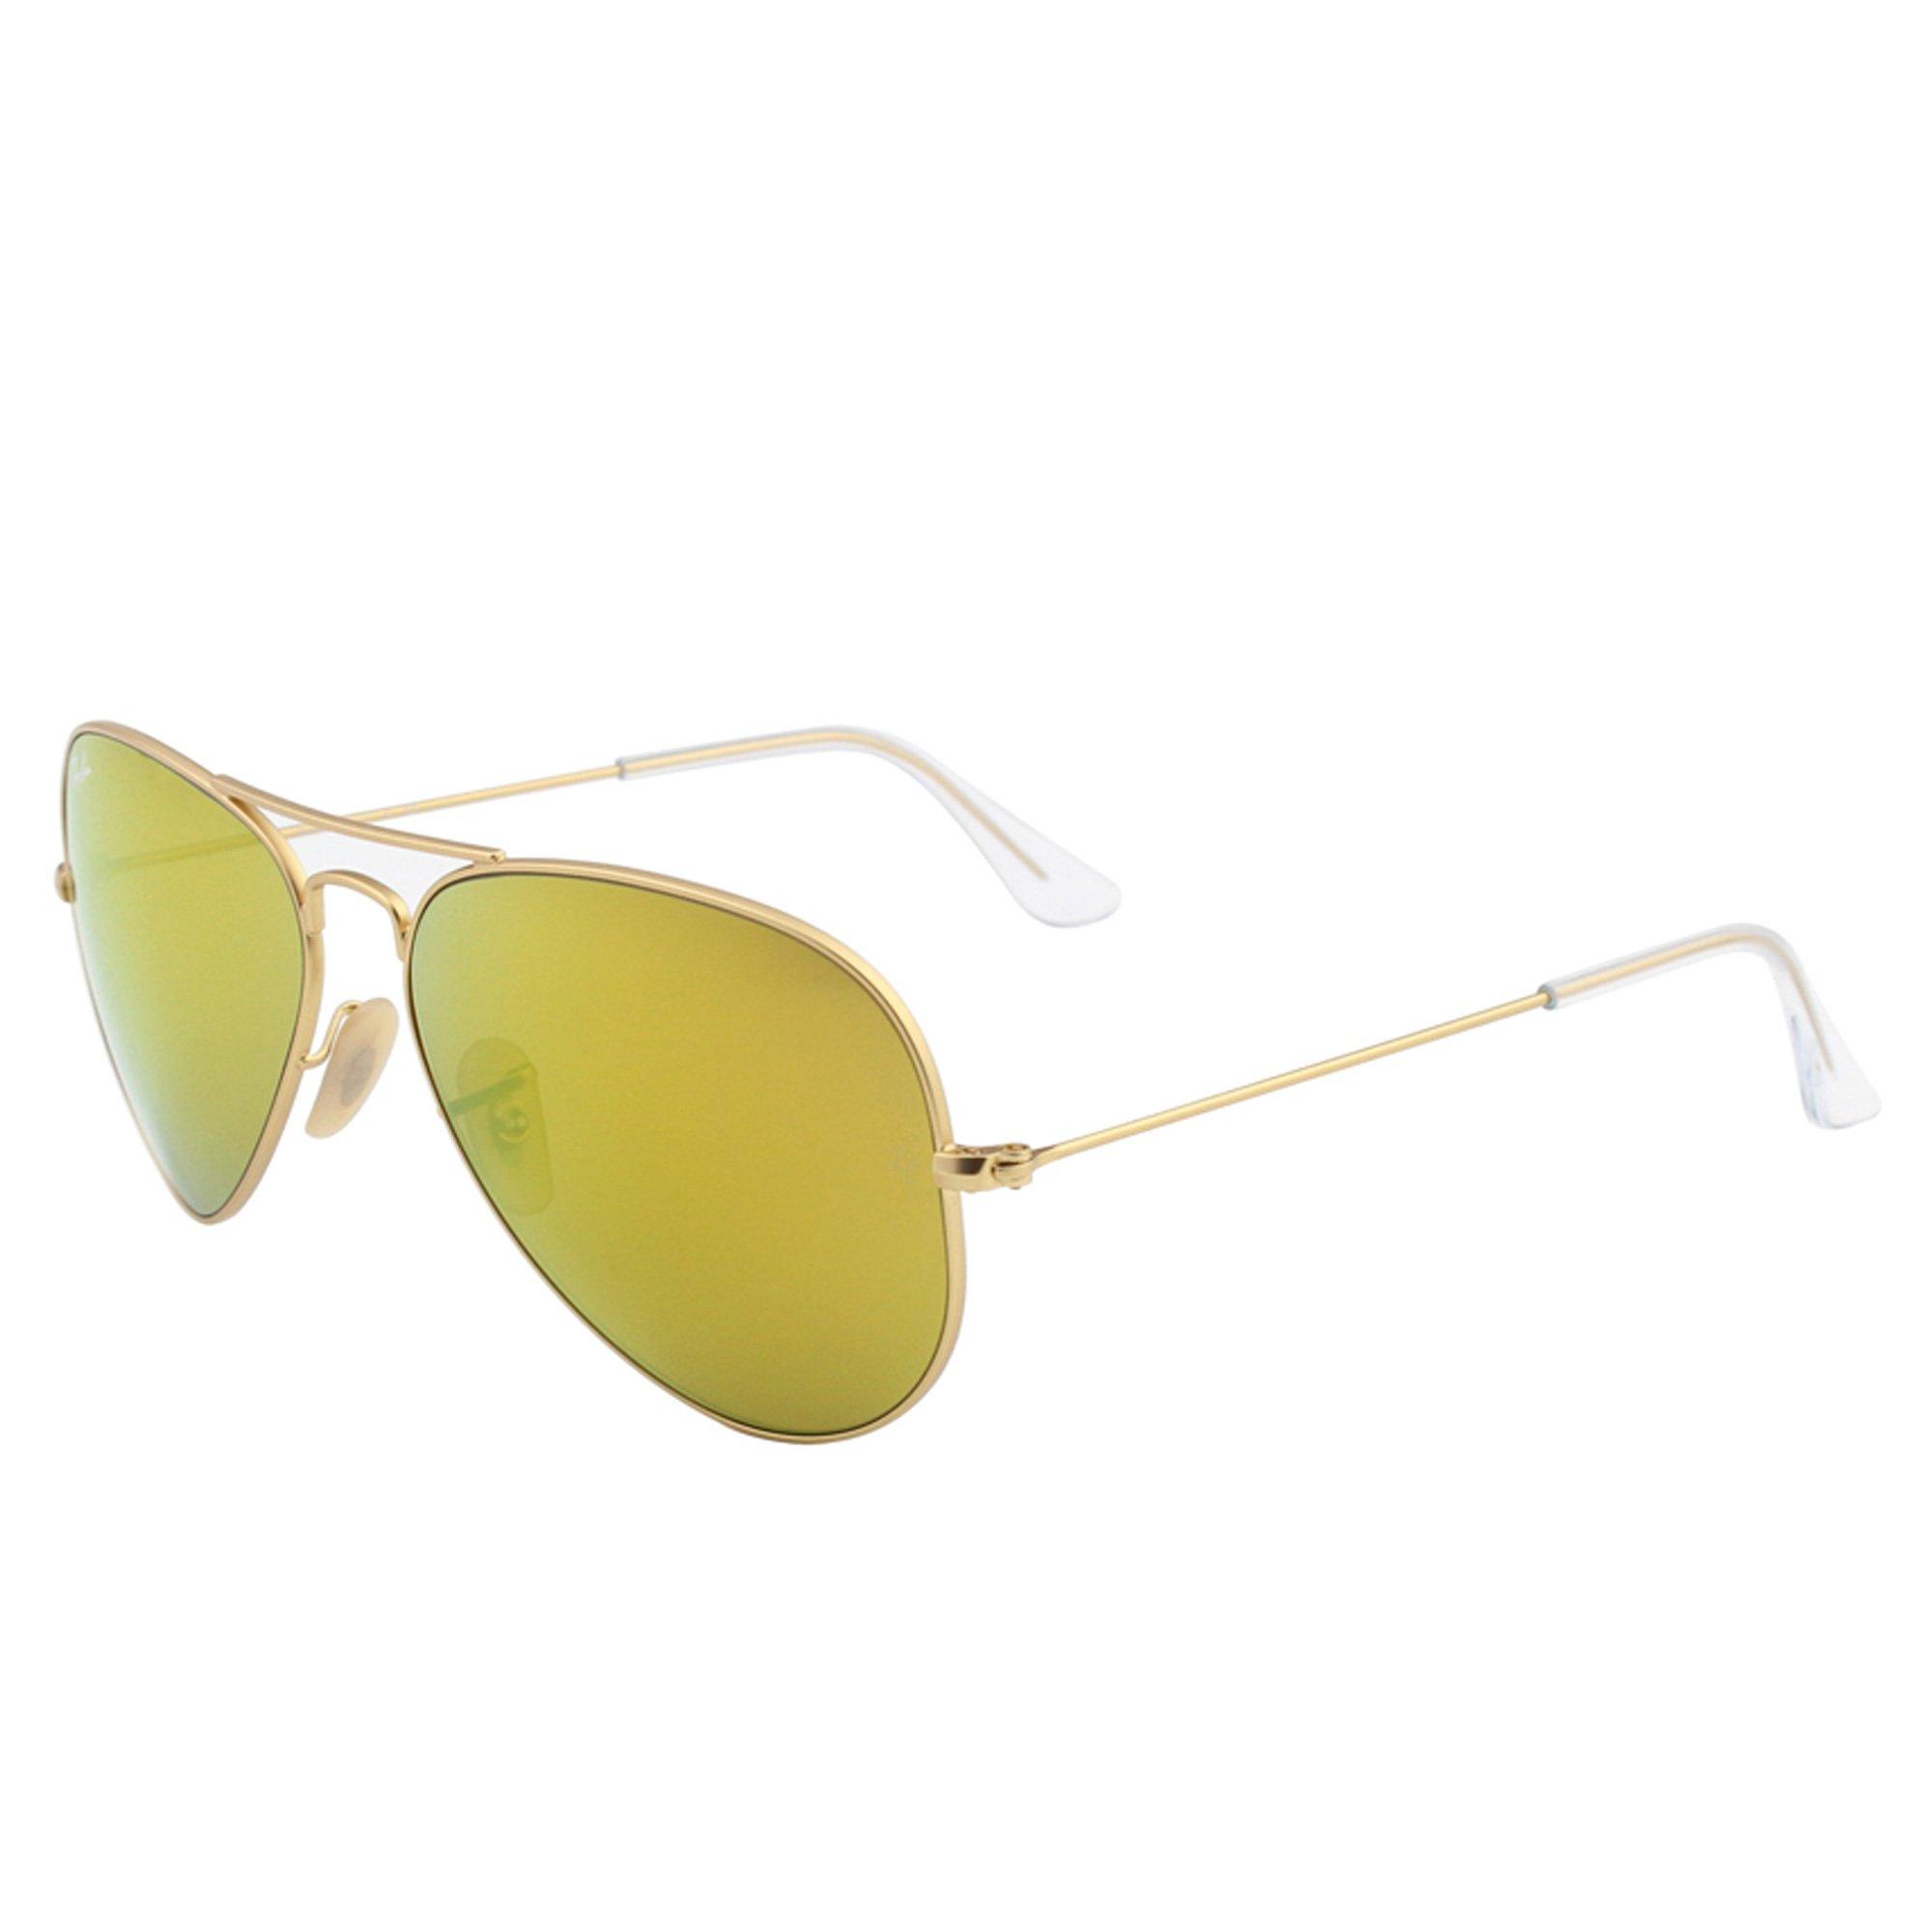 Ray-Ban Men's Aviator Large Metal Non-Polarized Iridium Sunglasses MATTE GOLD 58 mm